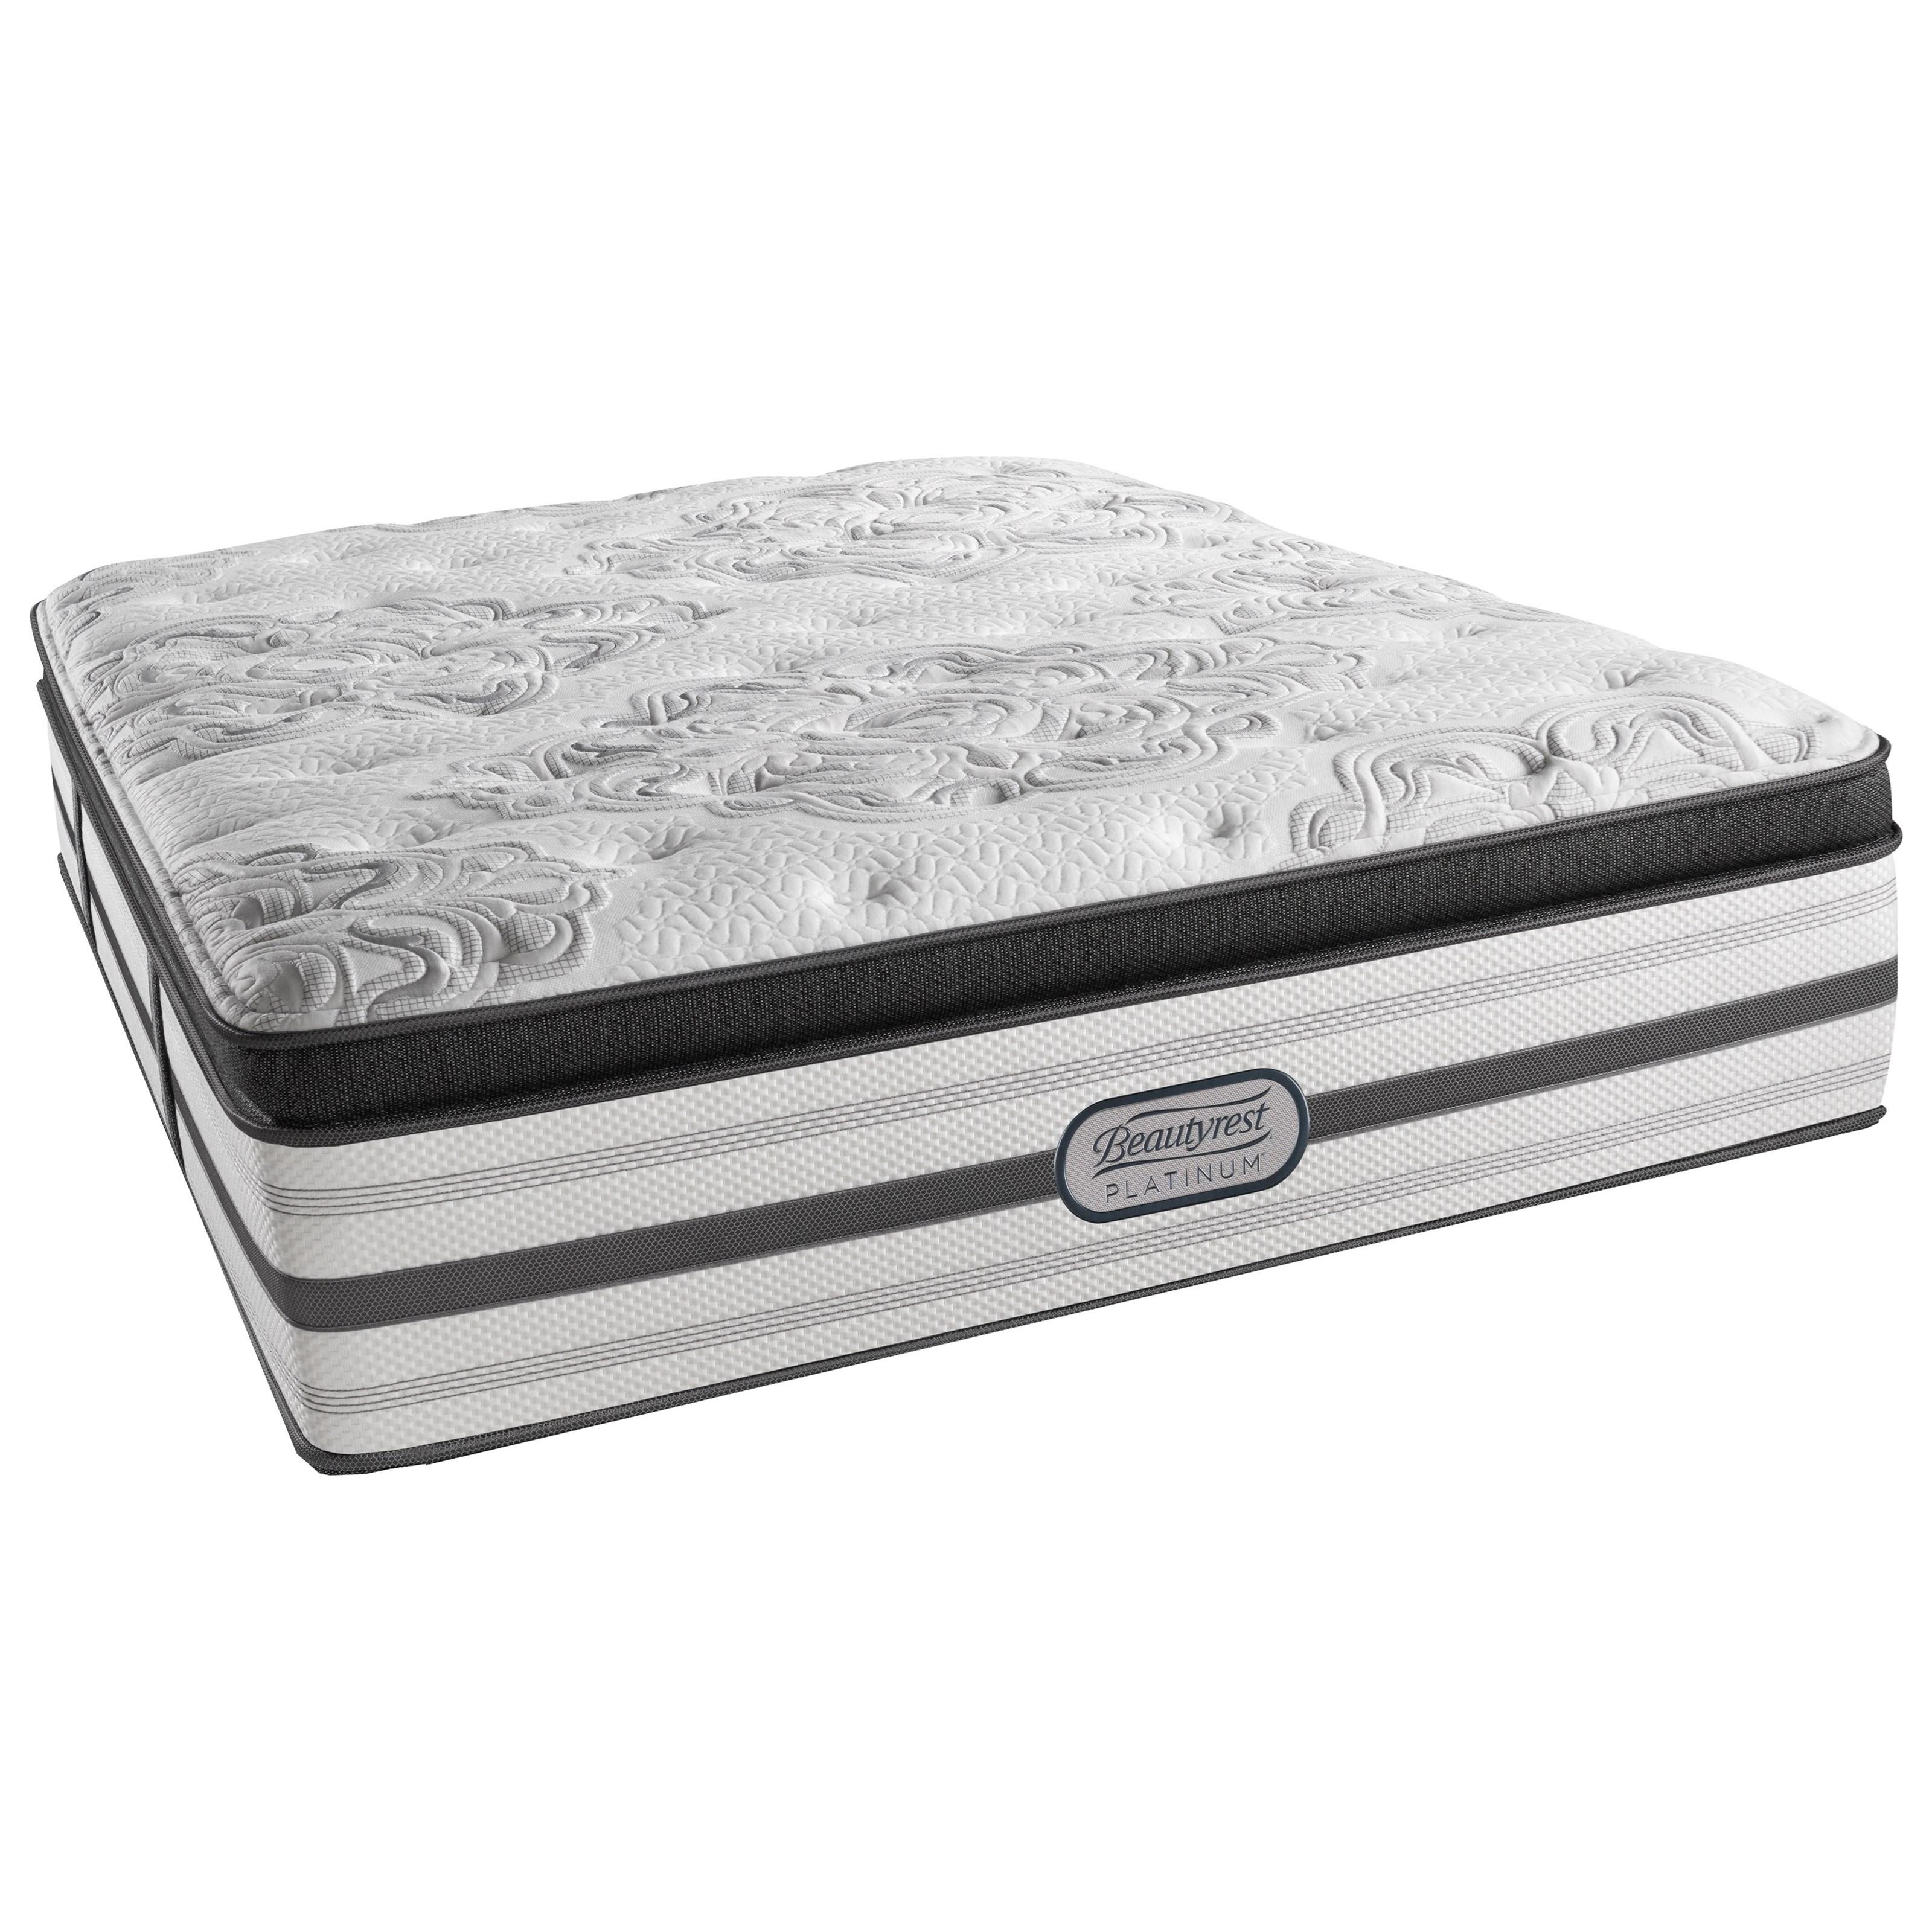 Beautyrest Platinum Katherine Twin XL Plush Box Top Adjustable Set - Item Number: LV4PLBT-TXL+SM3-TXL